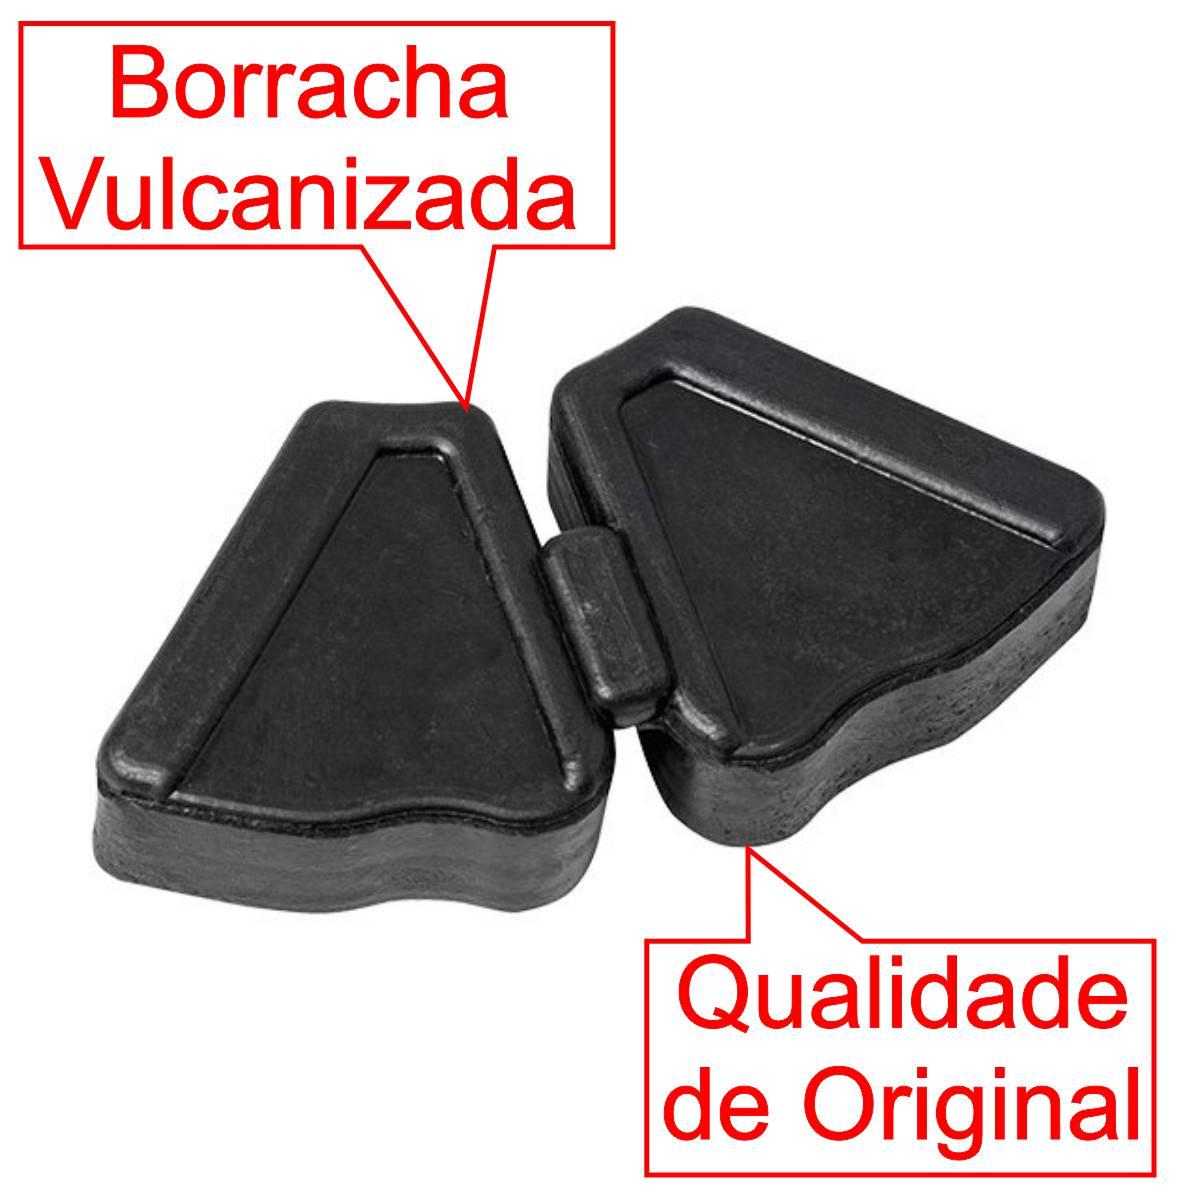 COXIM BRANDY CUBO TRASEIRO BORRACHA RODA MOTO HONDA C 100 BIZ